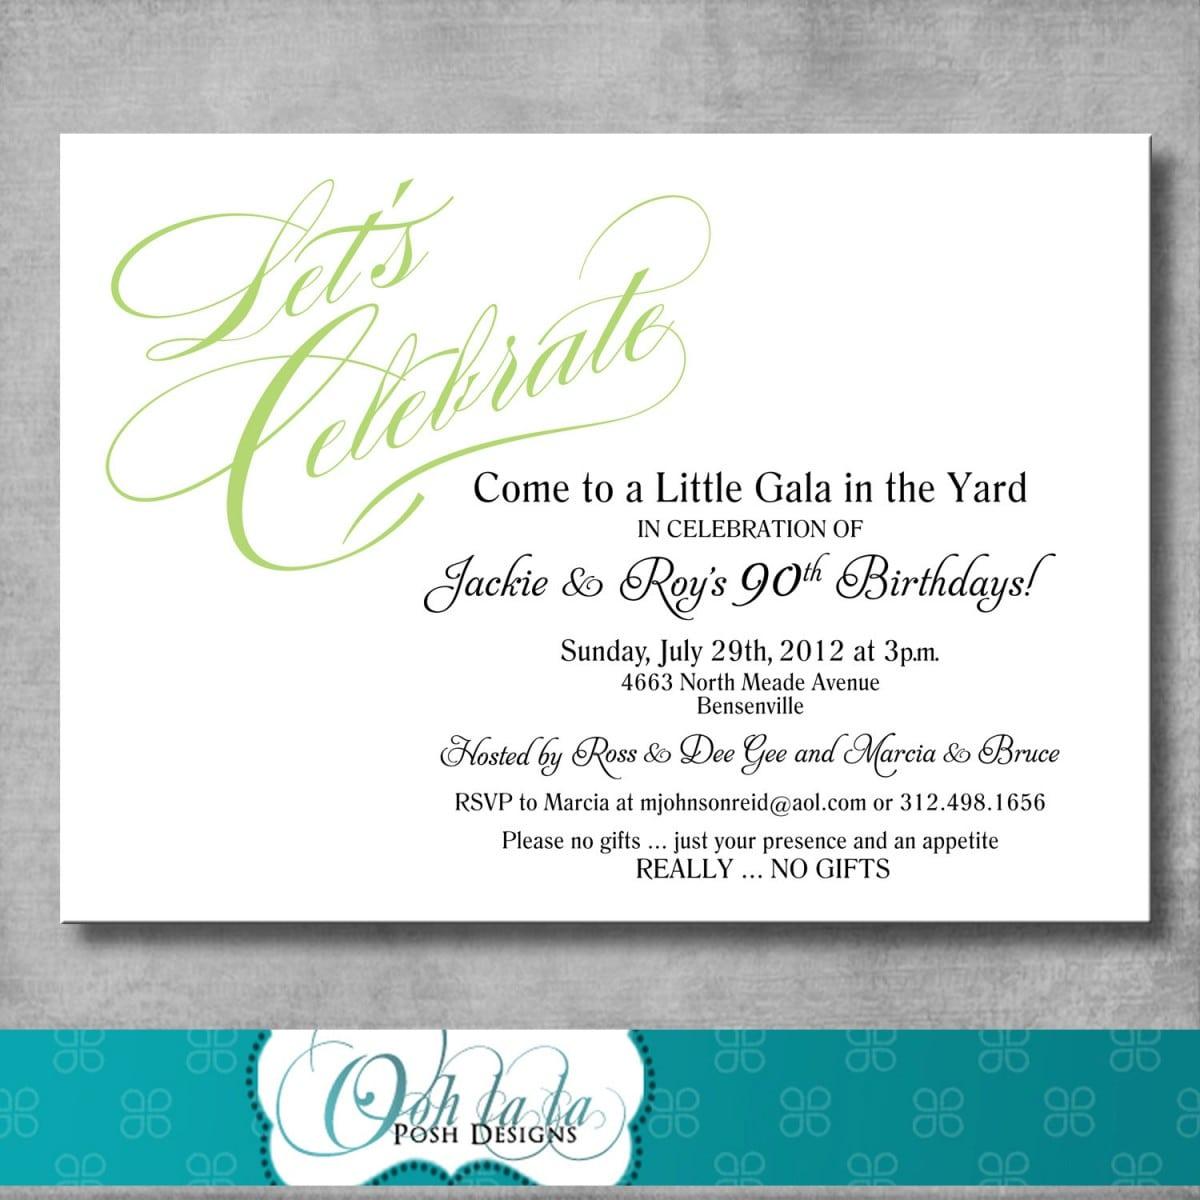 Invitation Wording General Party (5)